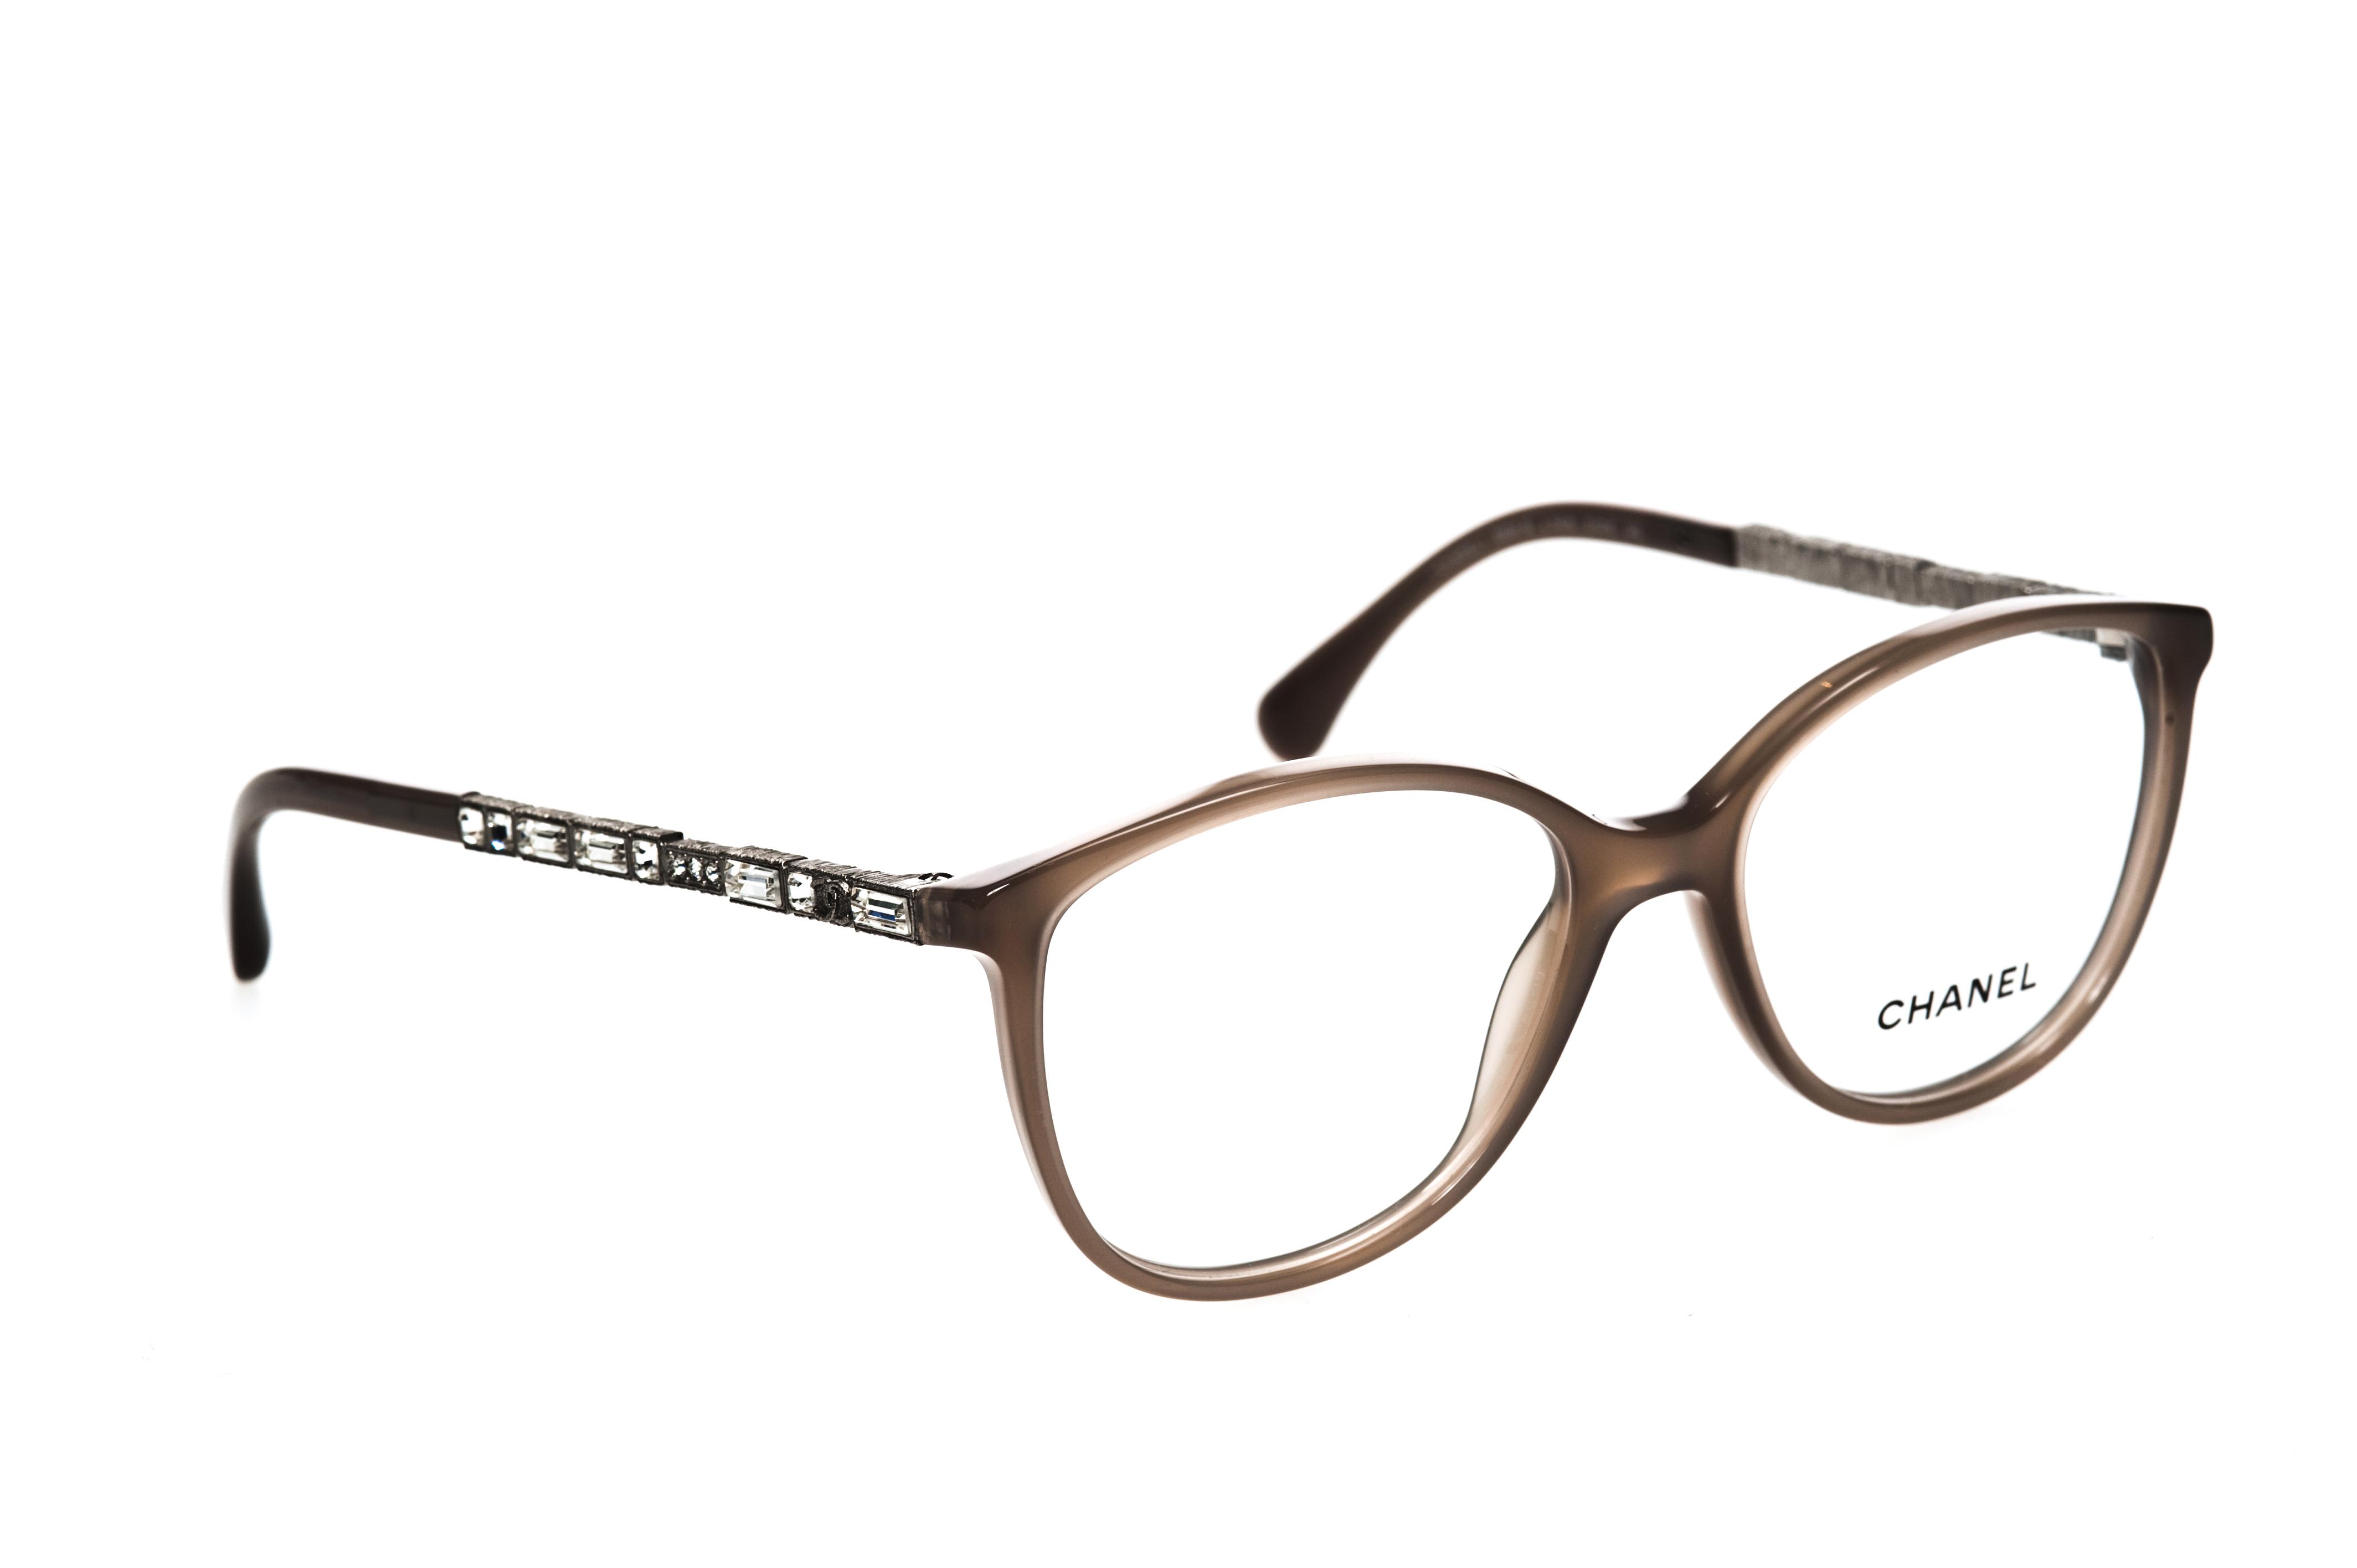 59f879688add Chanel-Brille 3304B in Farbe 1416 - Optoline Brillen-Blog